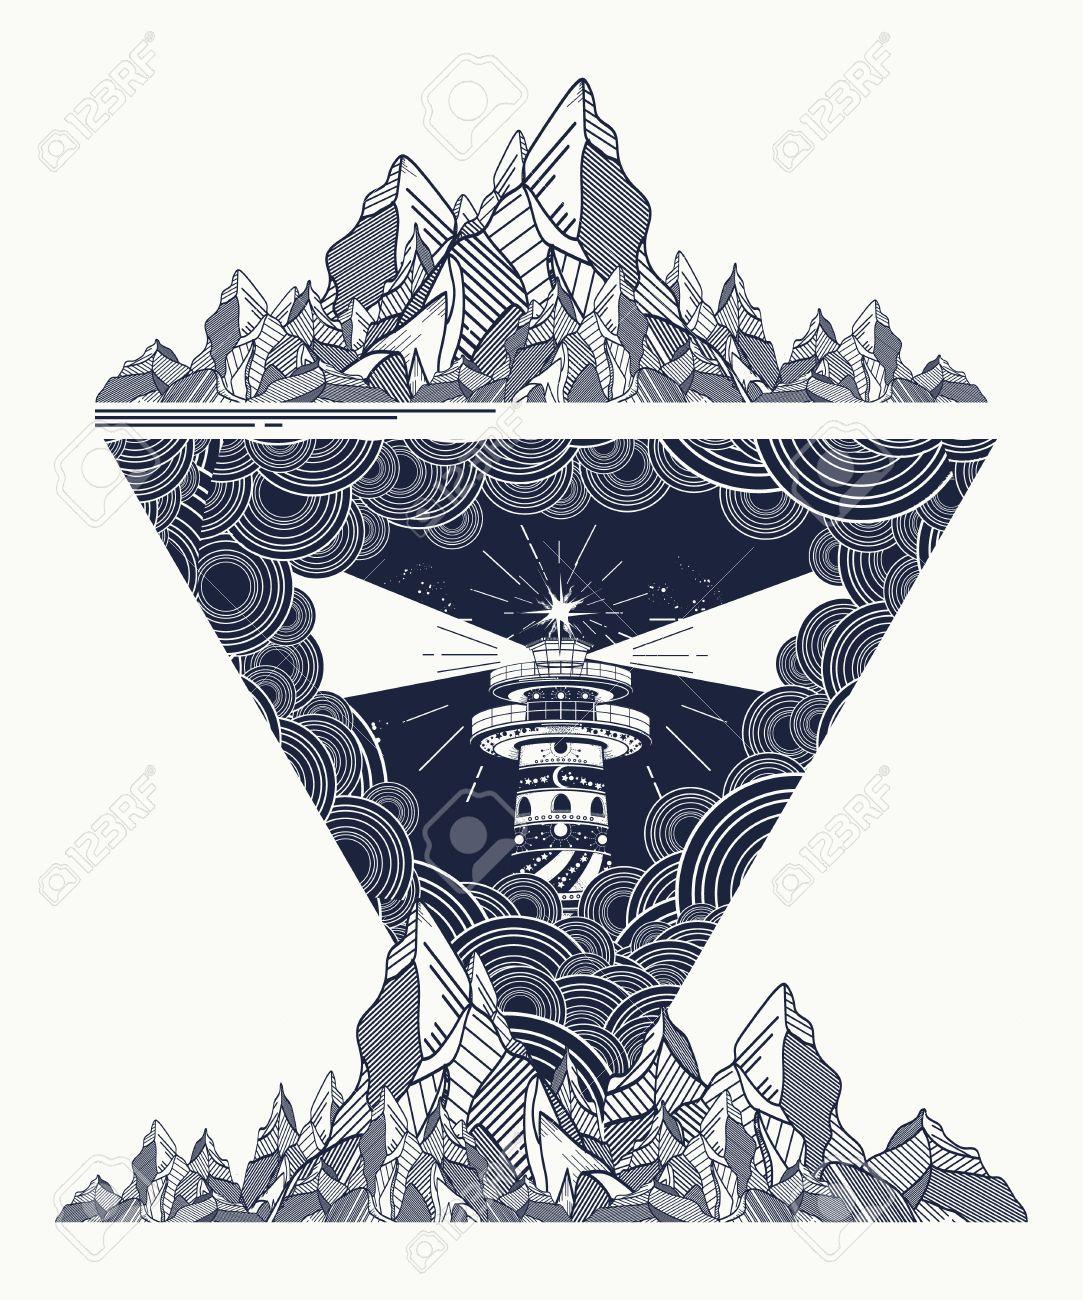 Lighthouse in the storm tattoo art, Lighthouse mountains geometric style tattoo, t-shirt design. Lighthouse marine tattoo, symbol of meditation, hiking, adventures - 67158651